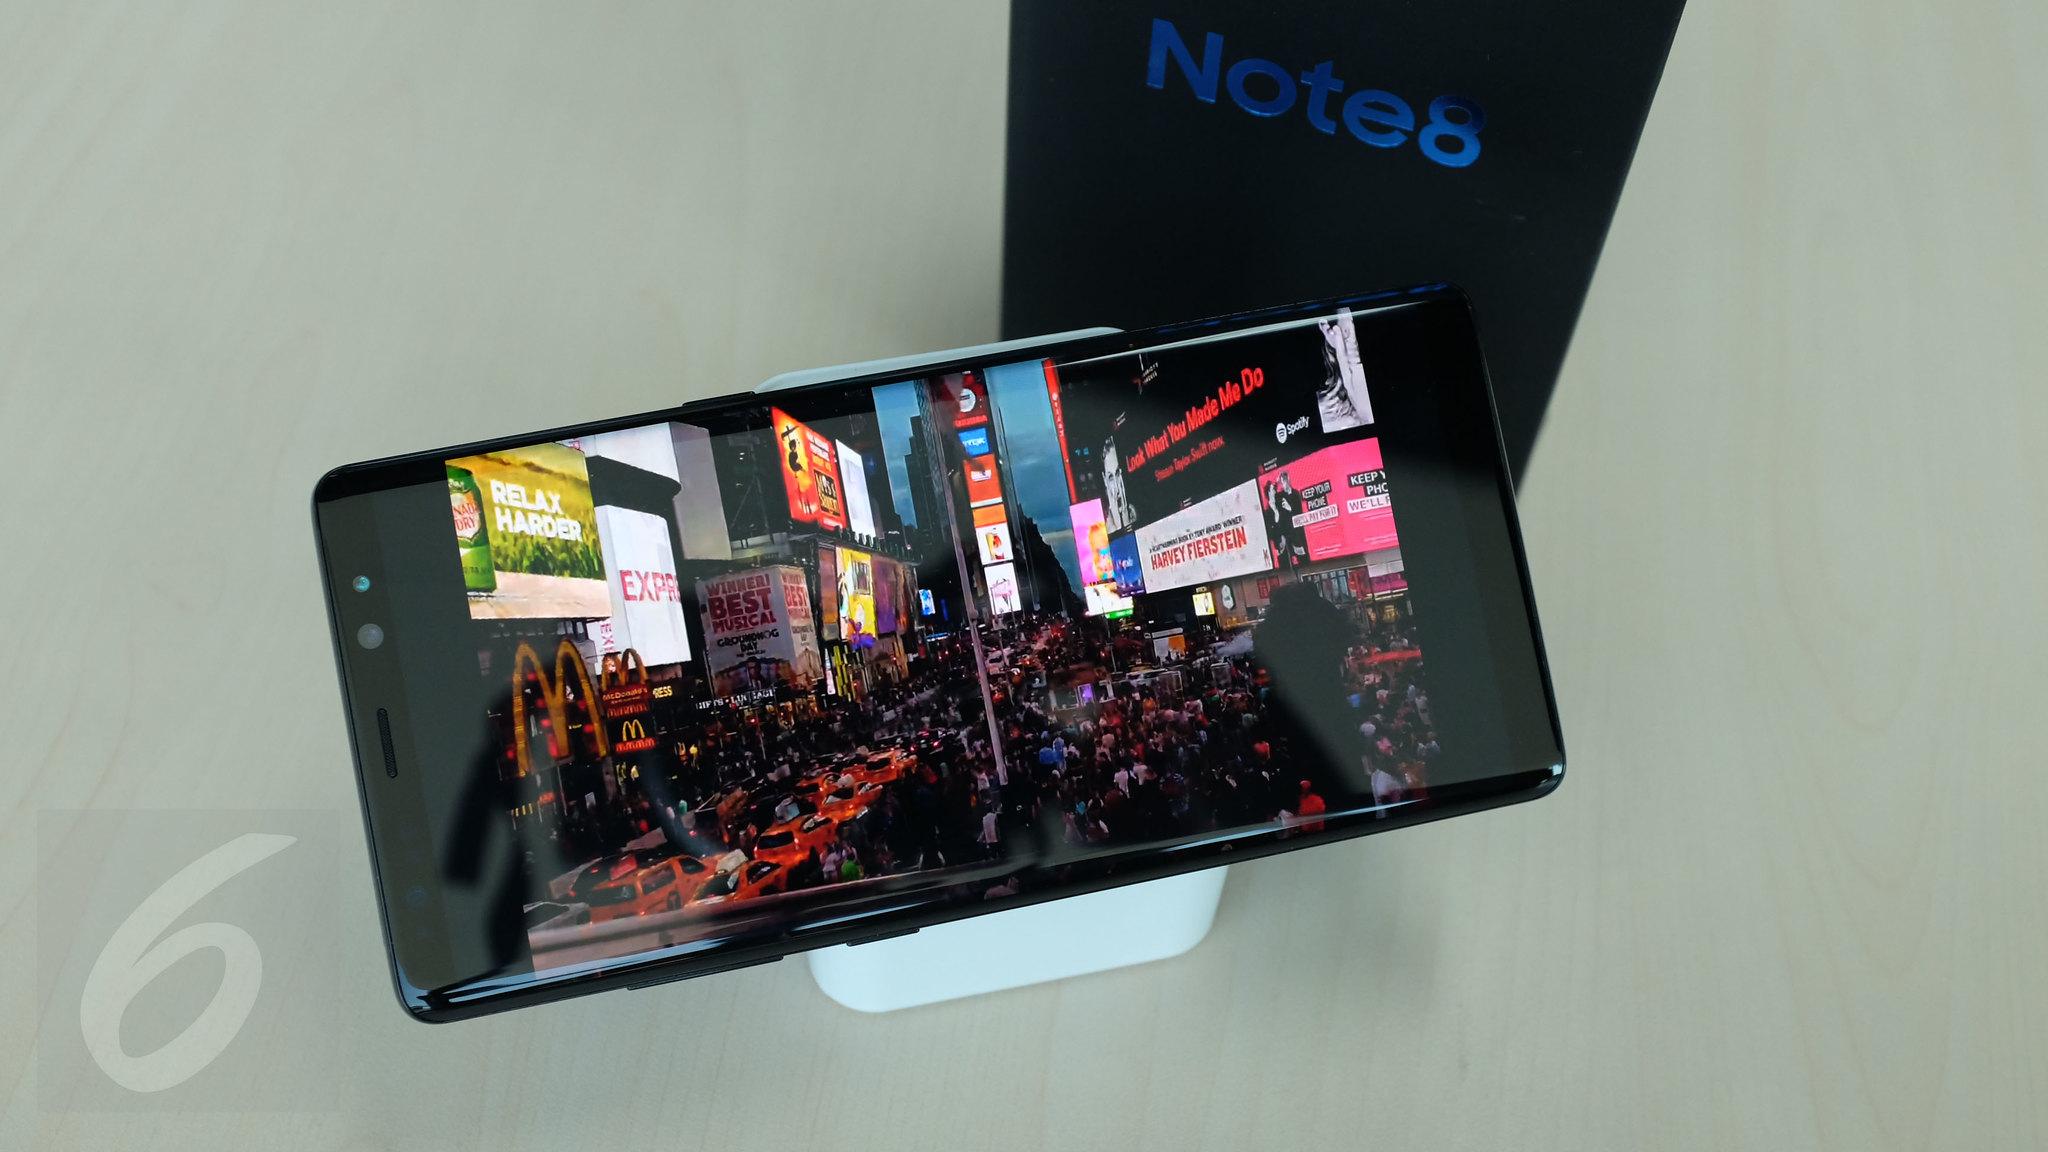 Galaxy Note 8. Liputan6.com/ Iskandar